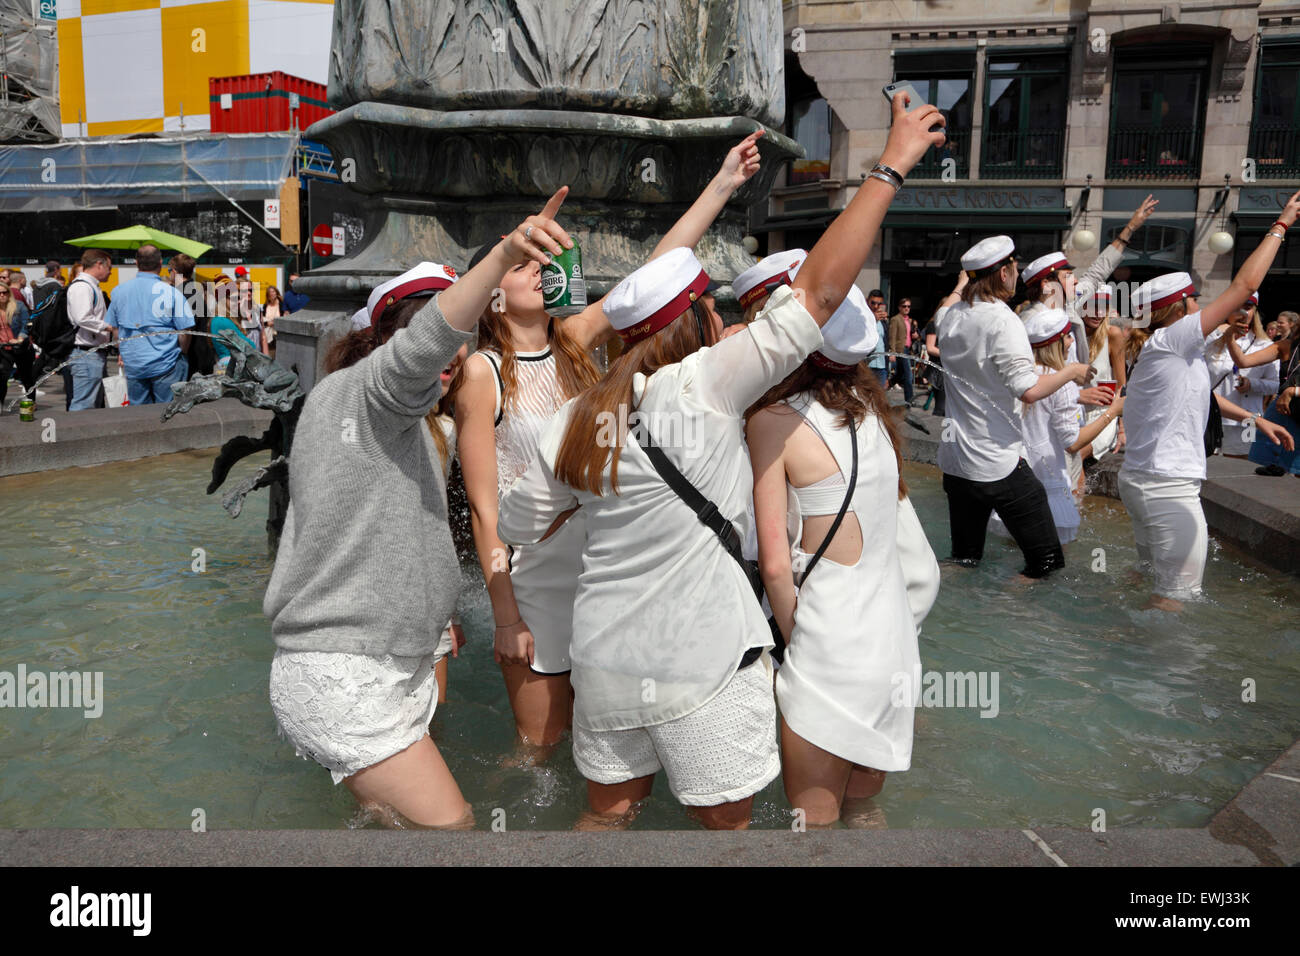 Copenhagen, Denmark. June 26, 2015. Danish students celebrate their high school graduation. A dance around and a - Stock Image